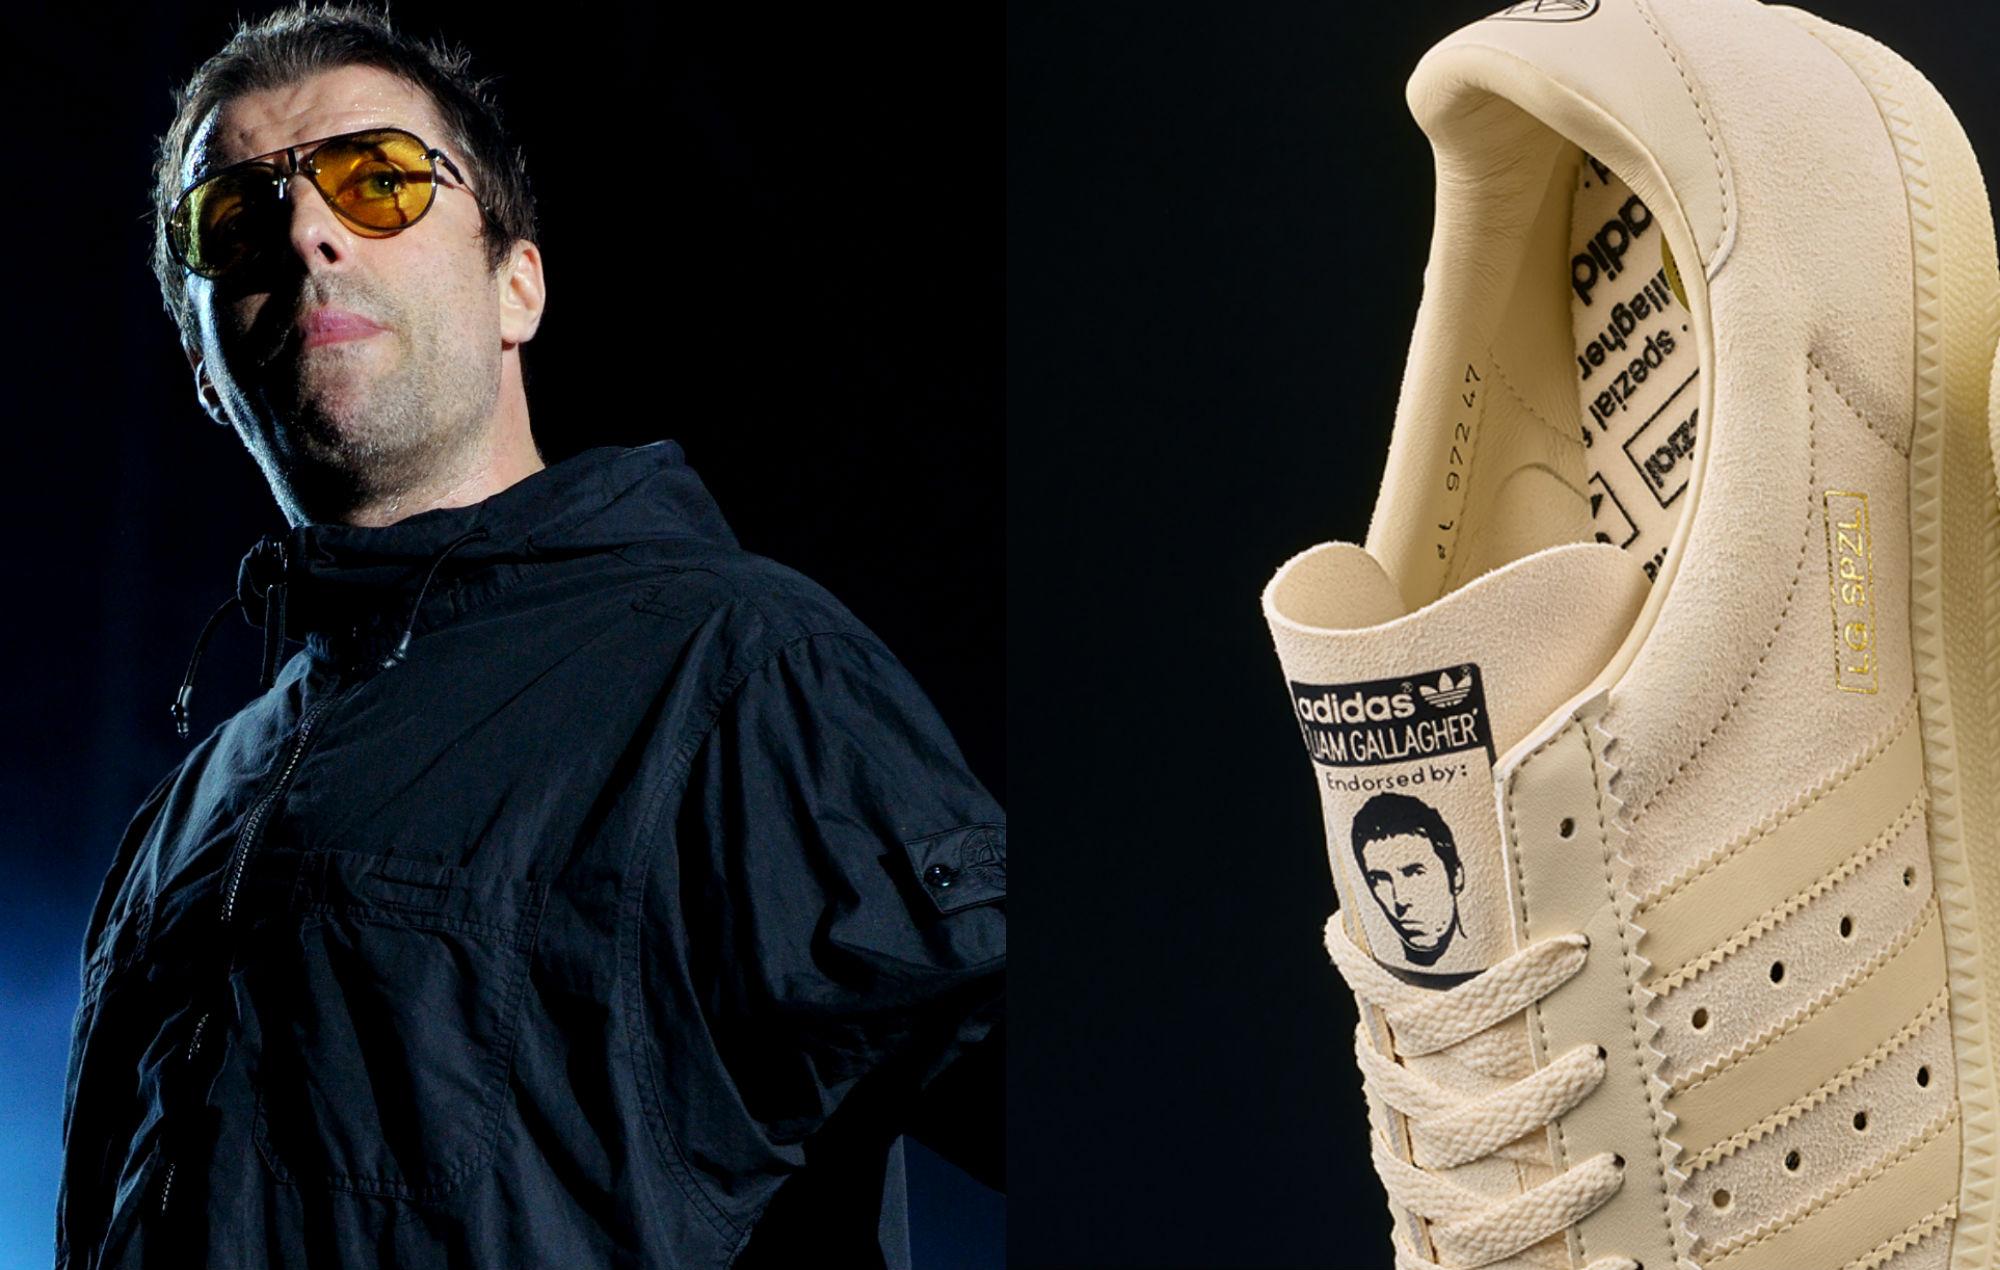 Liam Gallagher fans react as Adidas